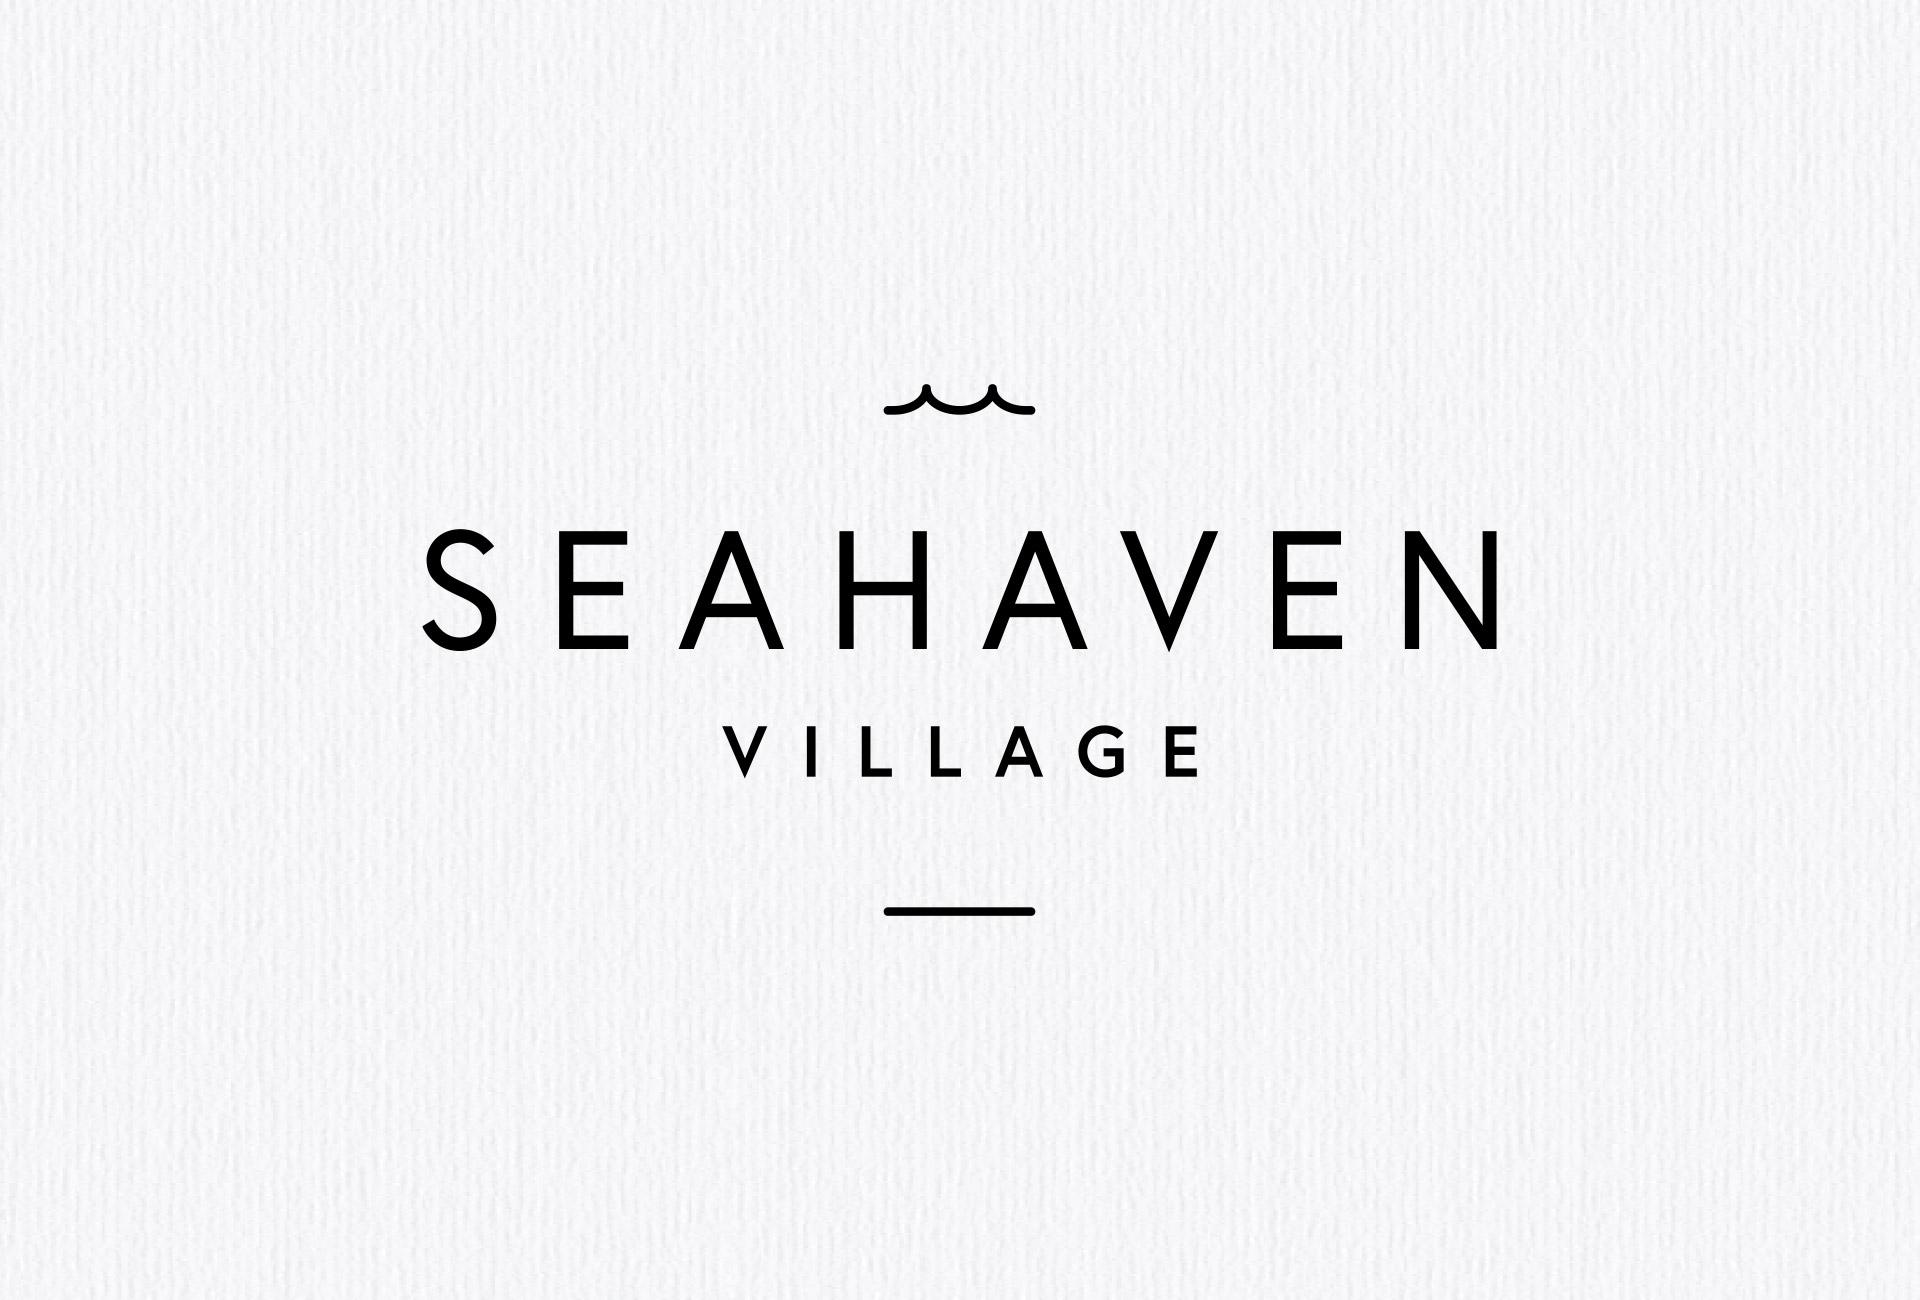 Seahaven Village